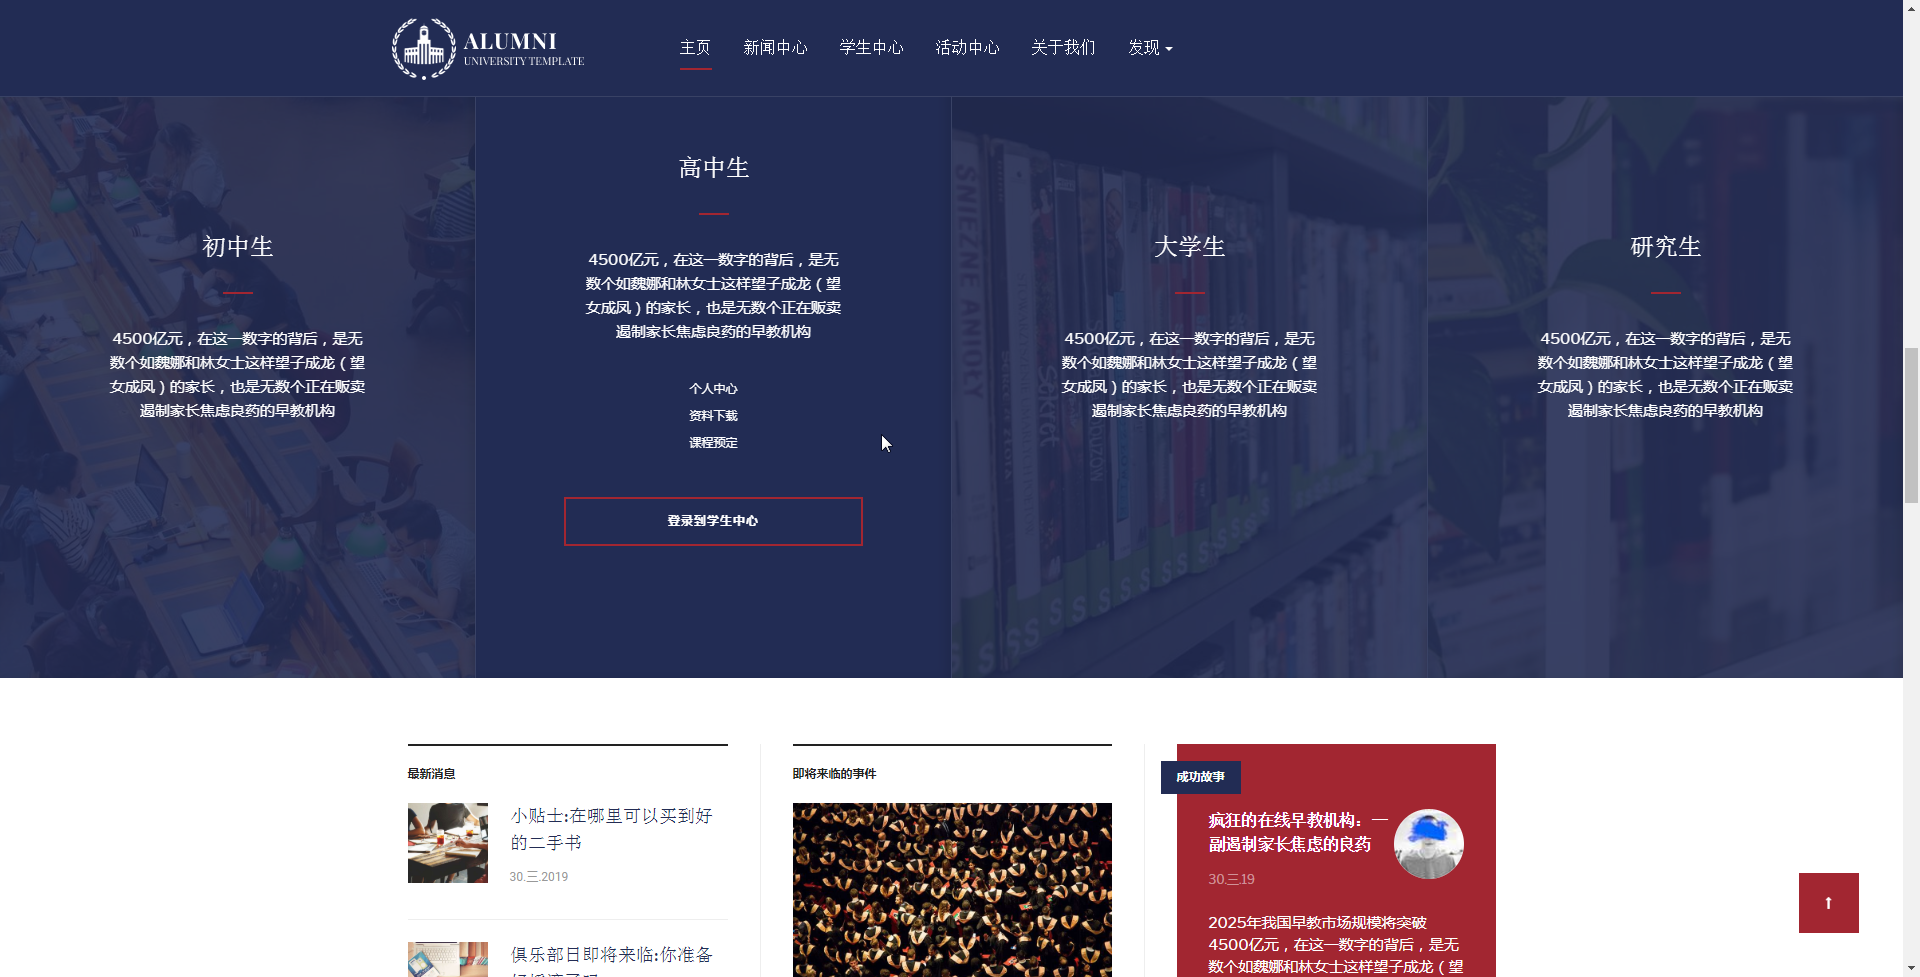 ja_alumni_首页模块2.png